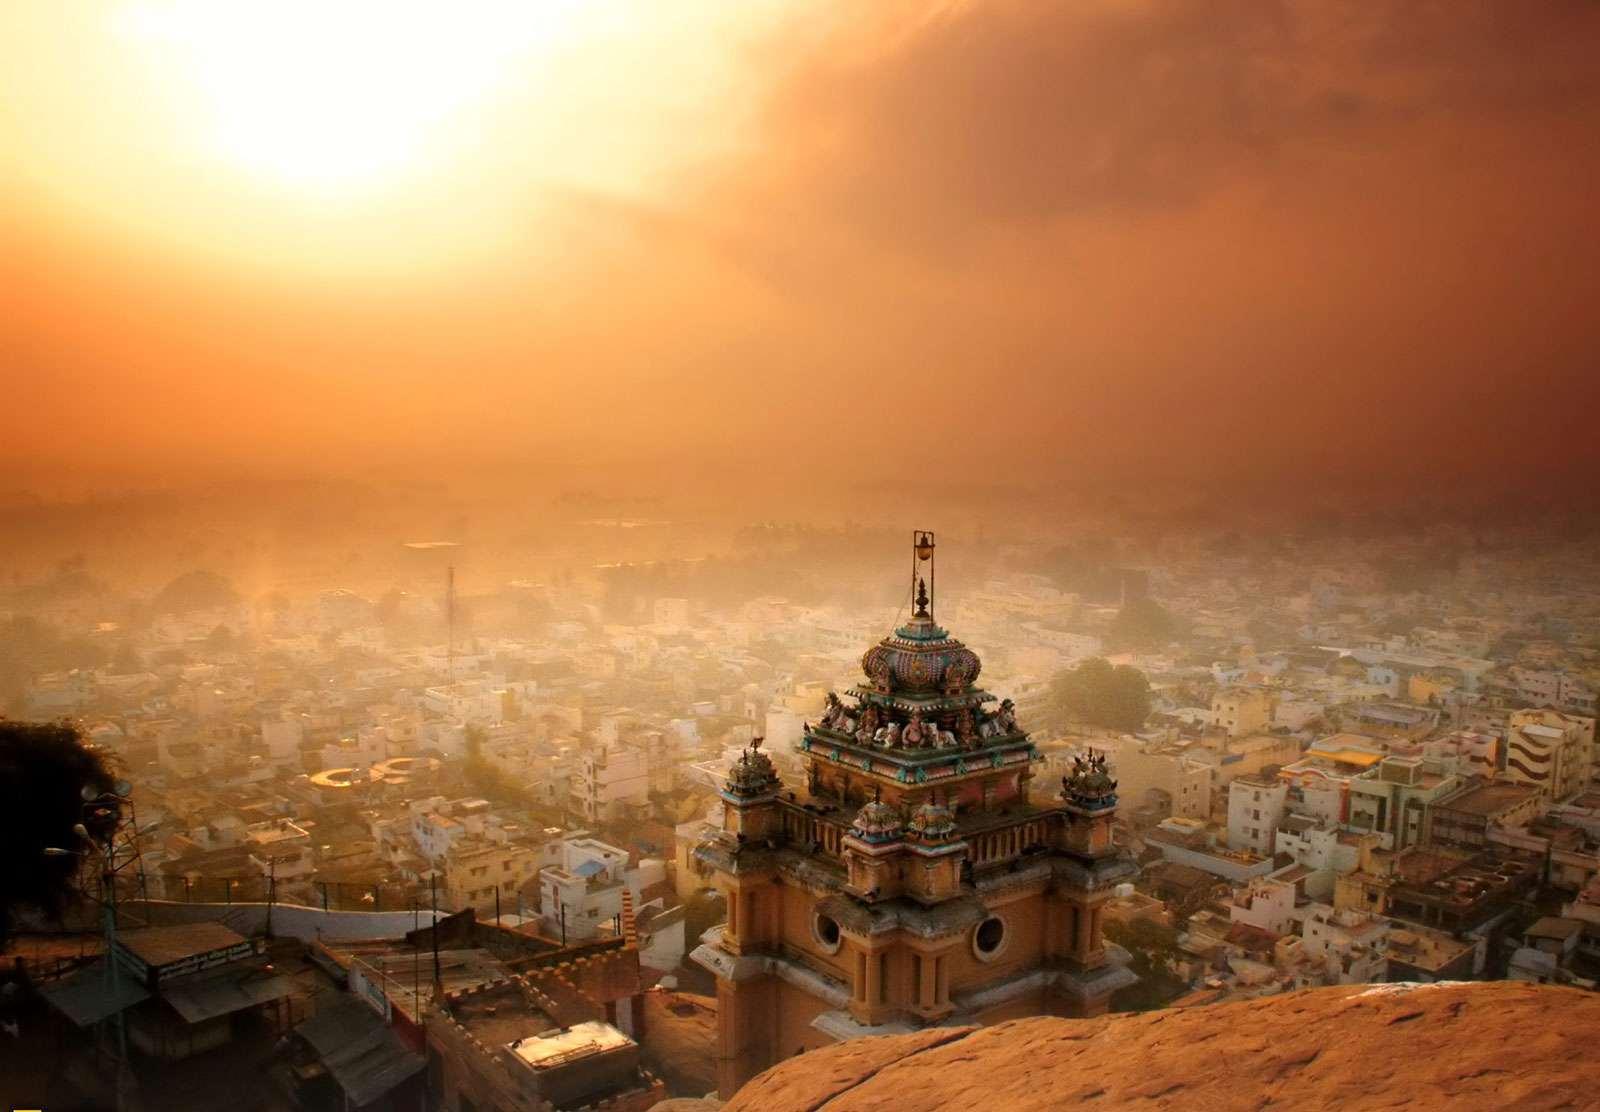 Heat wave; city of Madurai - photo from the Tamil Nadu Press